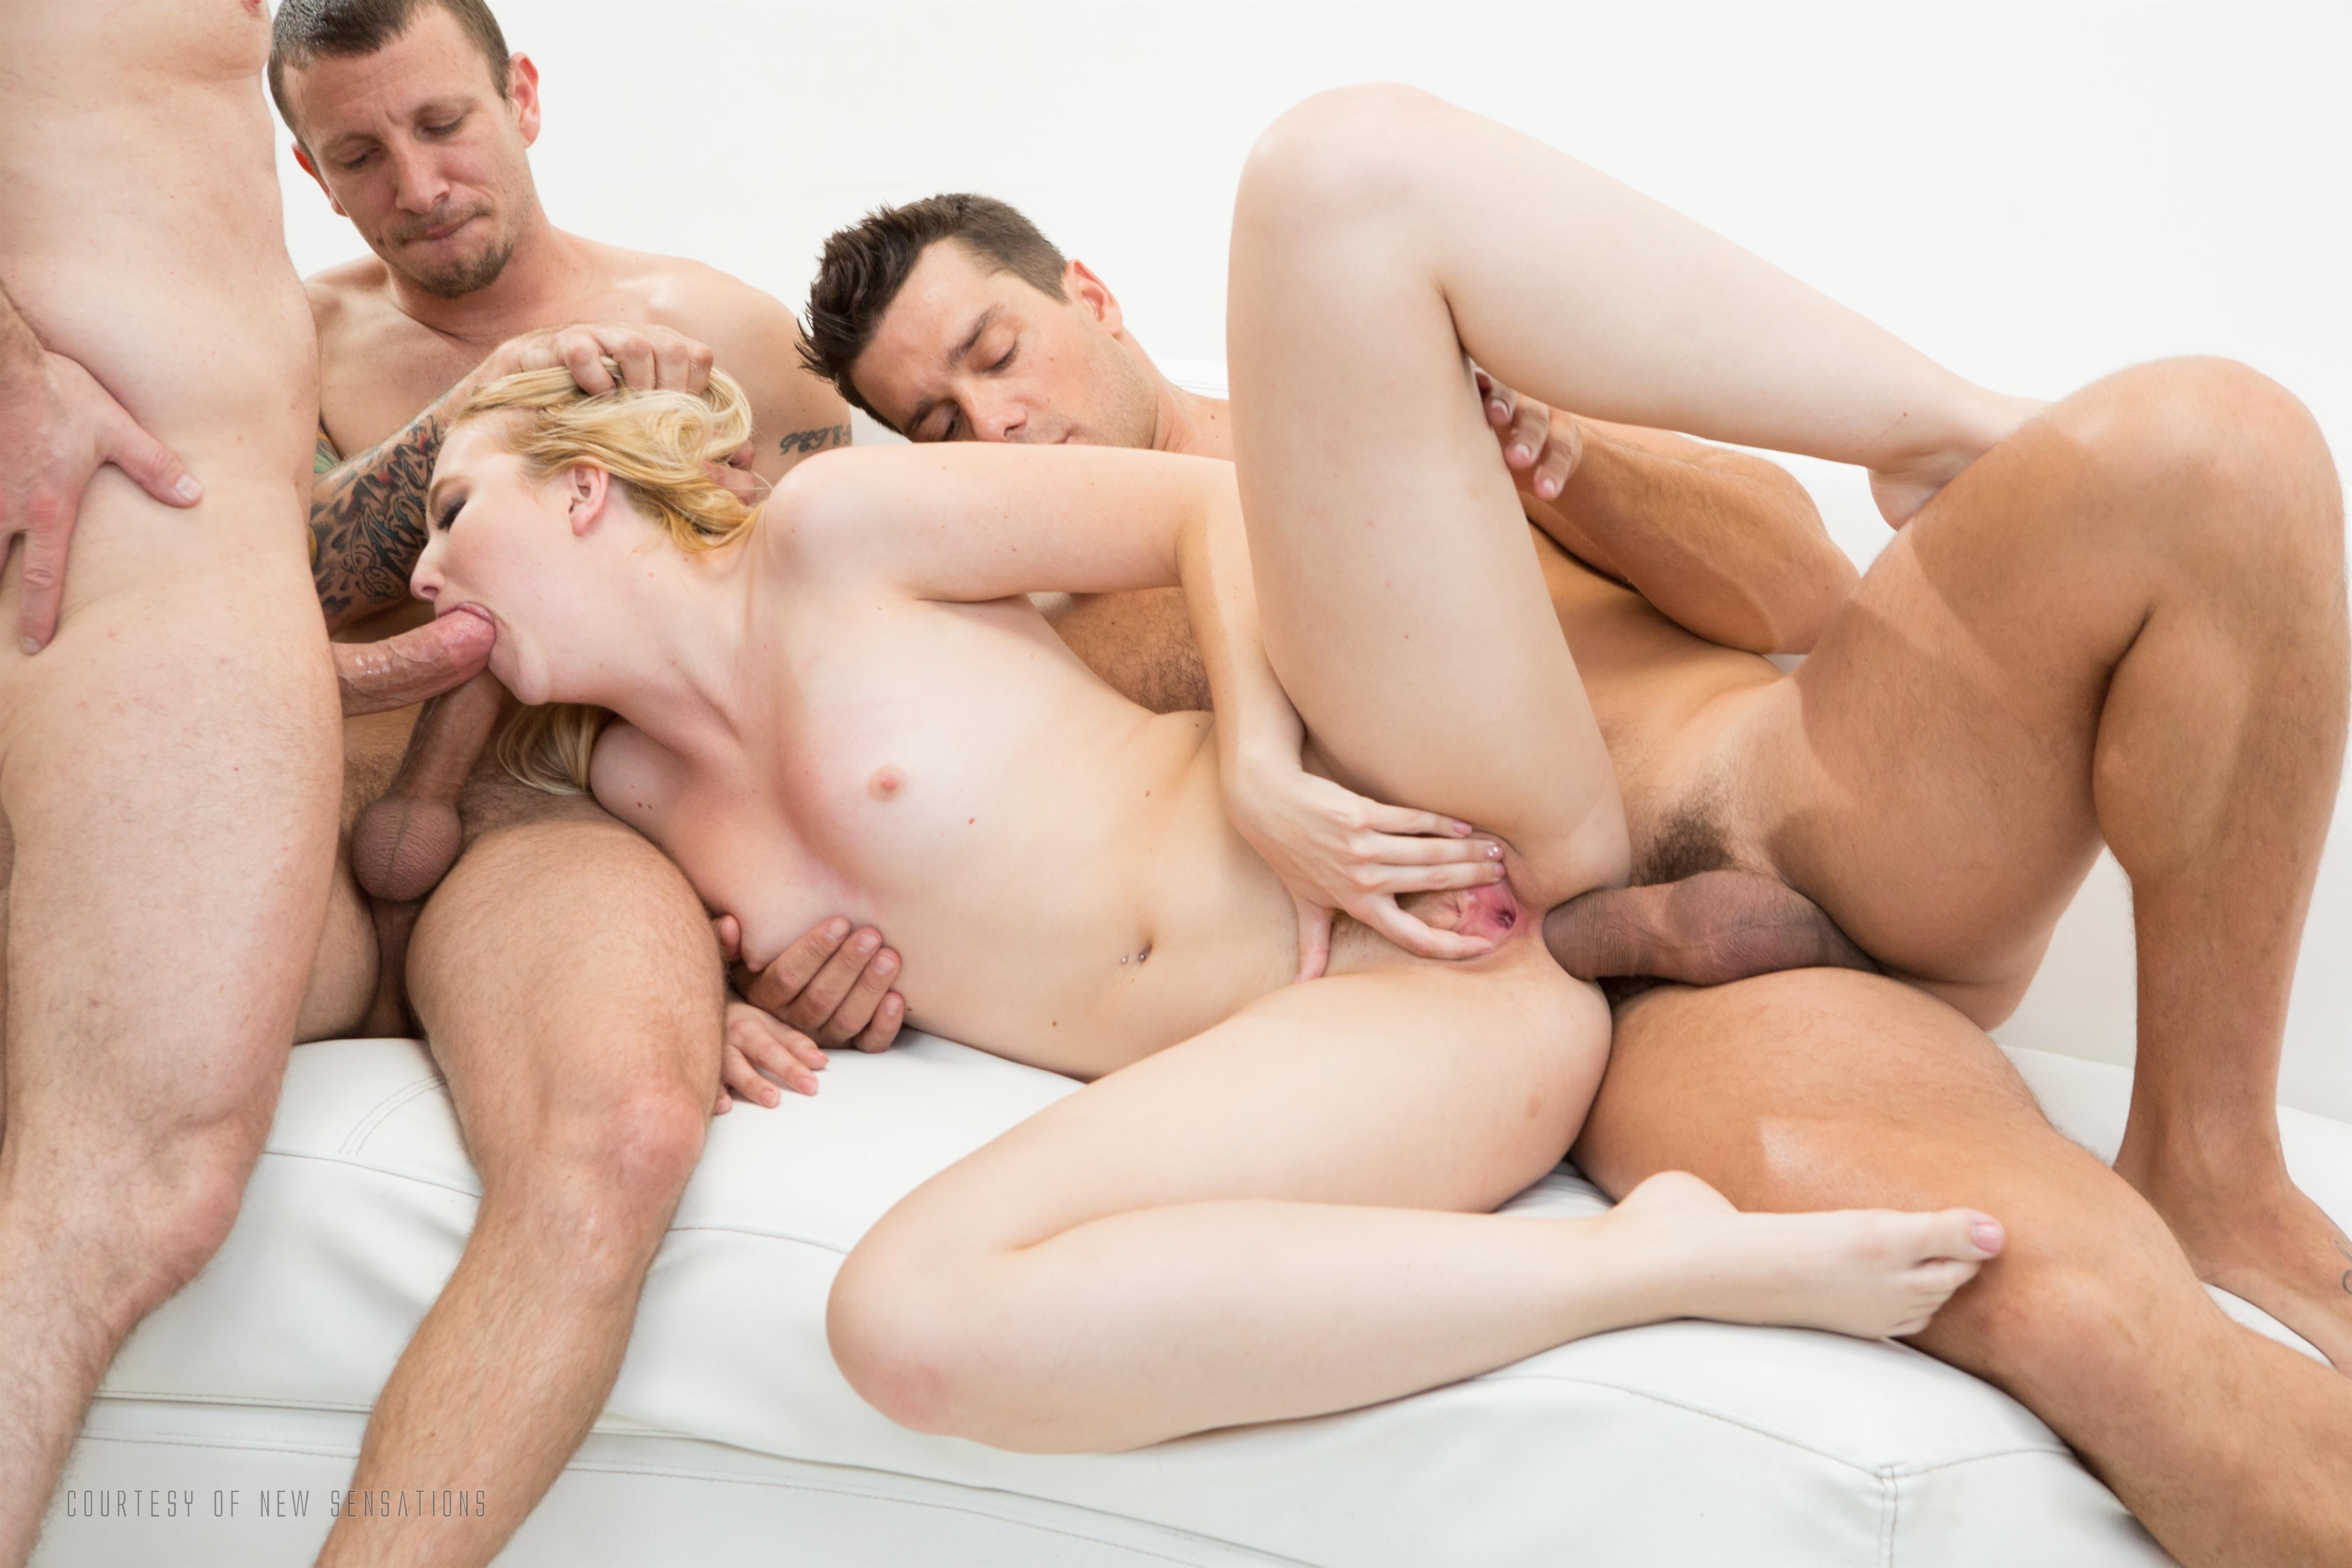 shemale pornos free gang bang porno